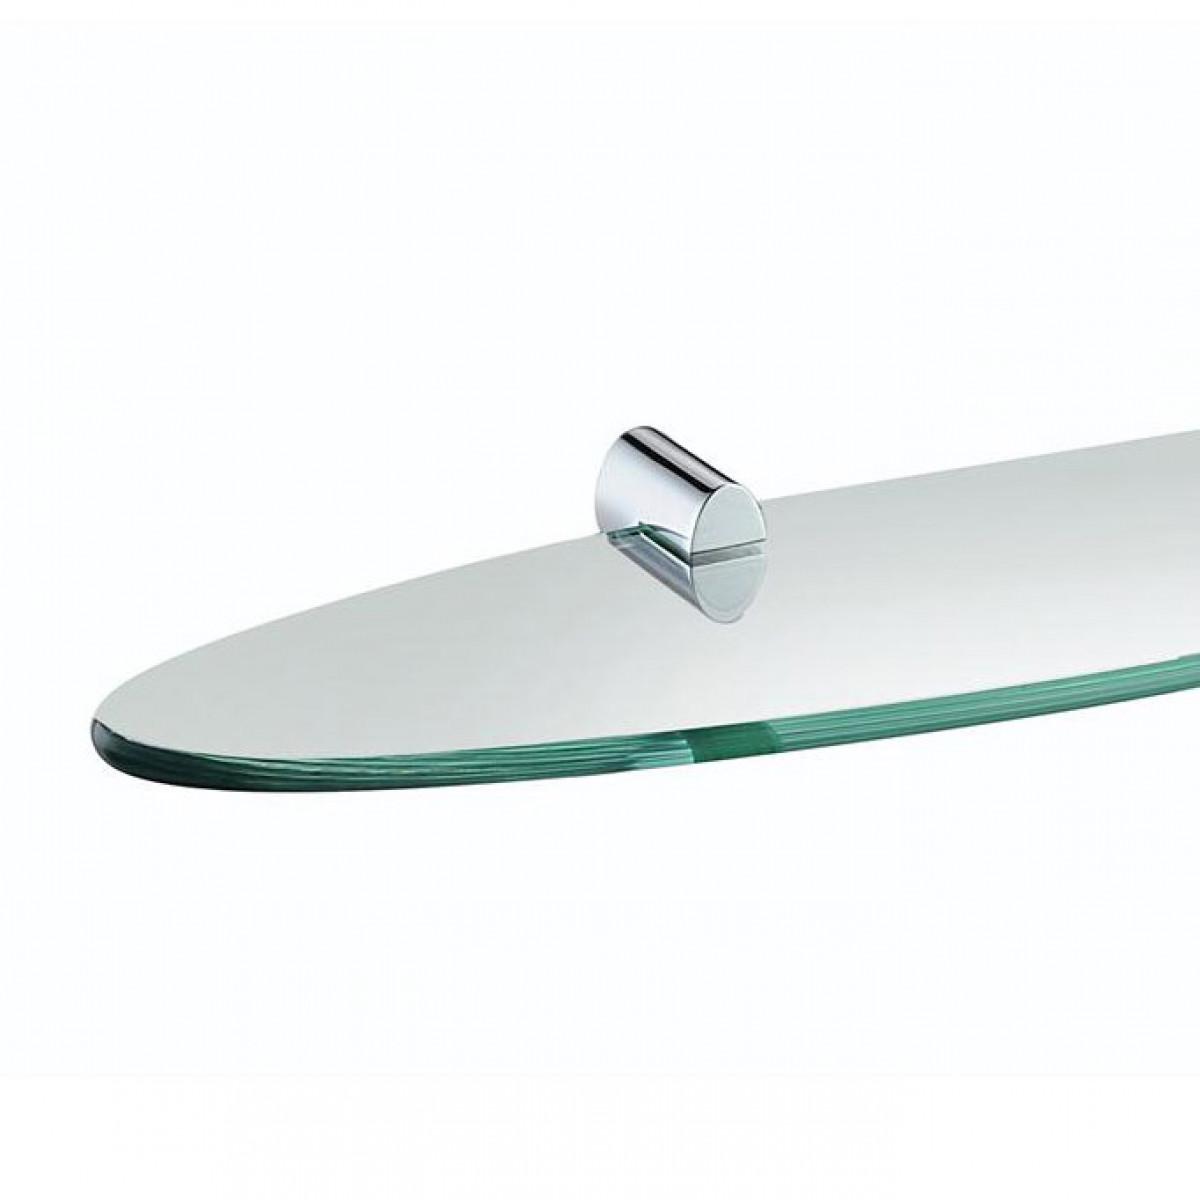 Bristan Oval Chrome 495mm Toughened Safety Glass Shelf